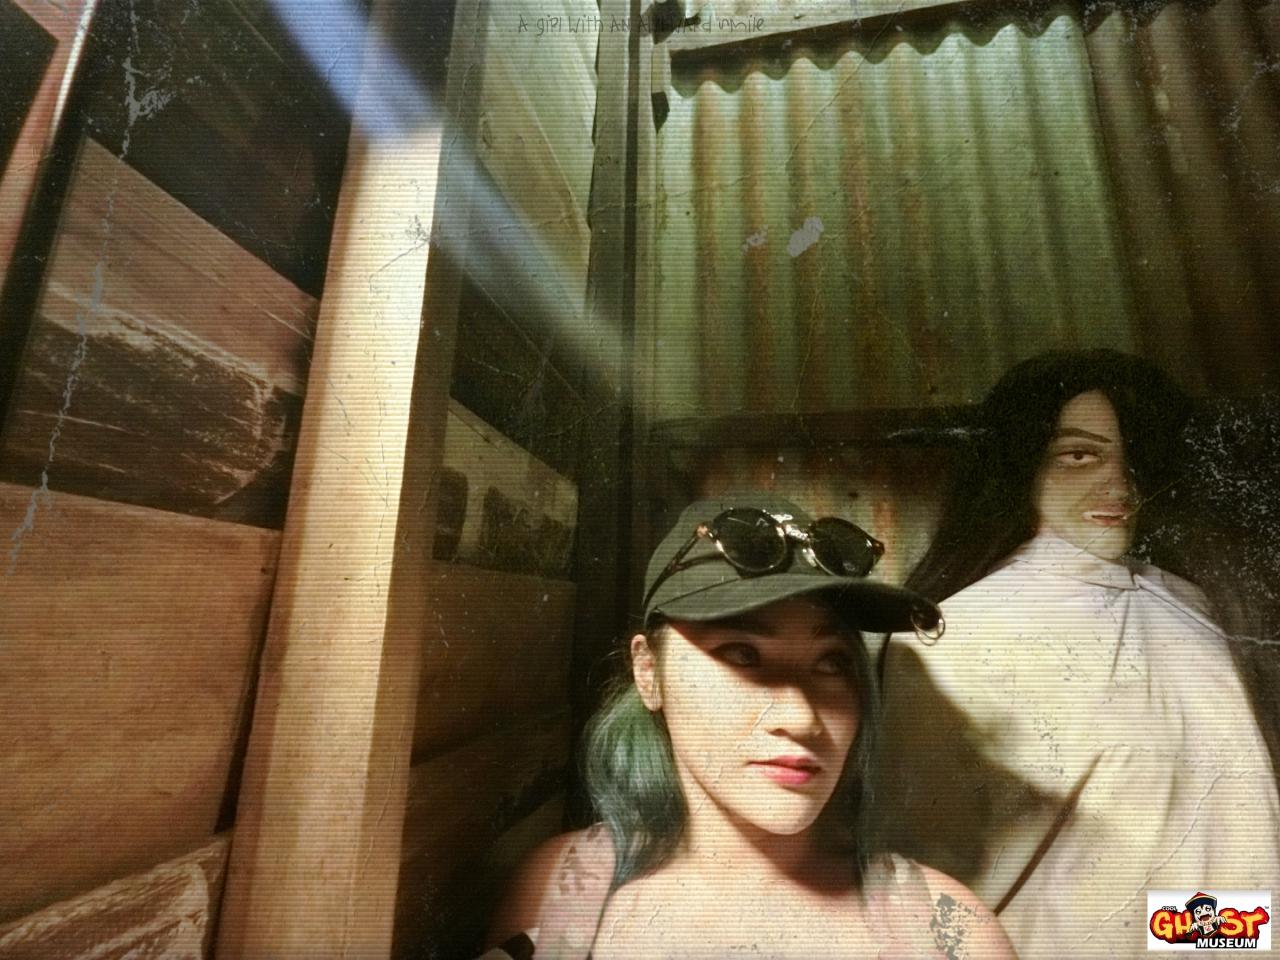 Ghost Museum @Penang : Ghost